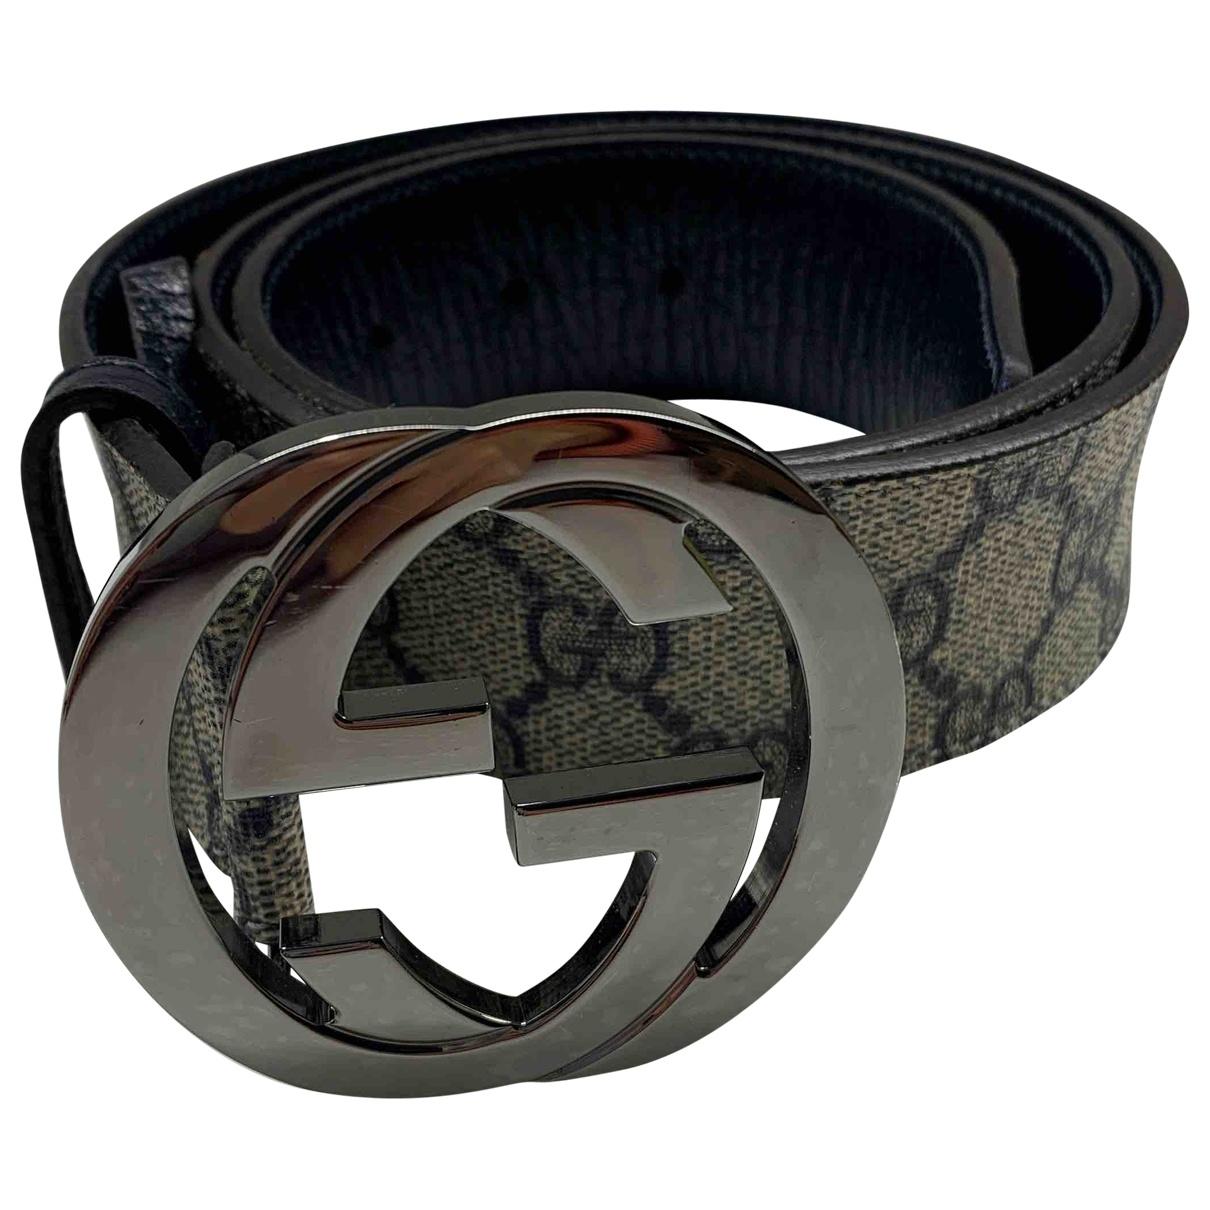 Gucci Interlocking Buckle Blue Leather belt for Women 85 cm